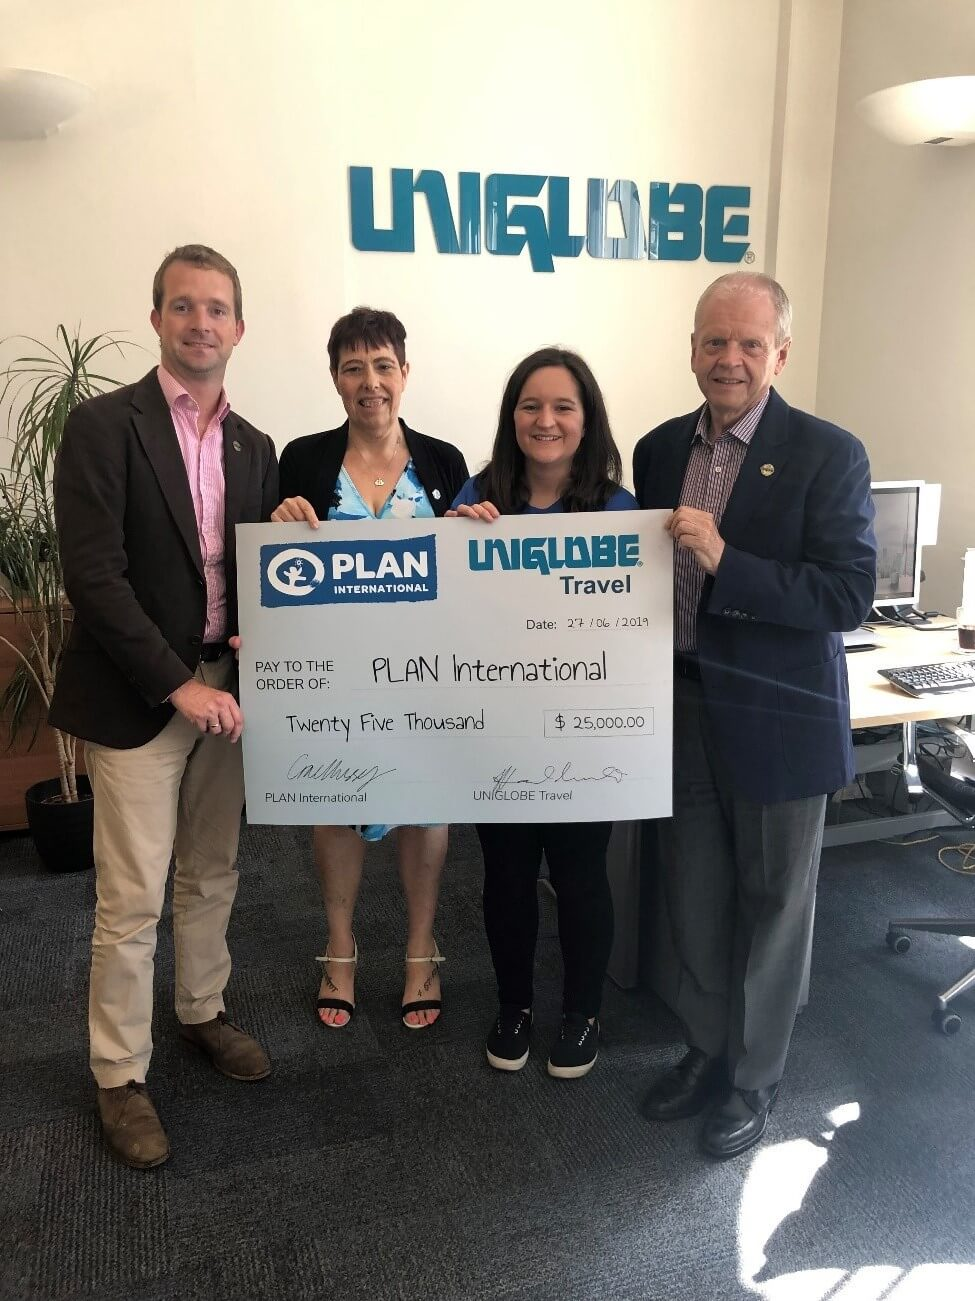 UNIGLOBE Travel gives $25,000 to Plan International UK education program for child refugees